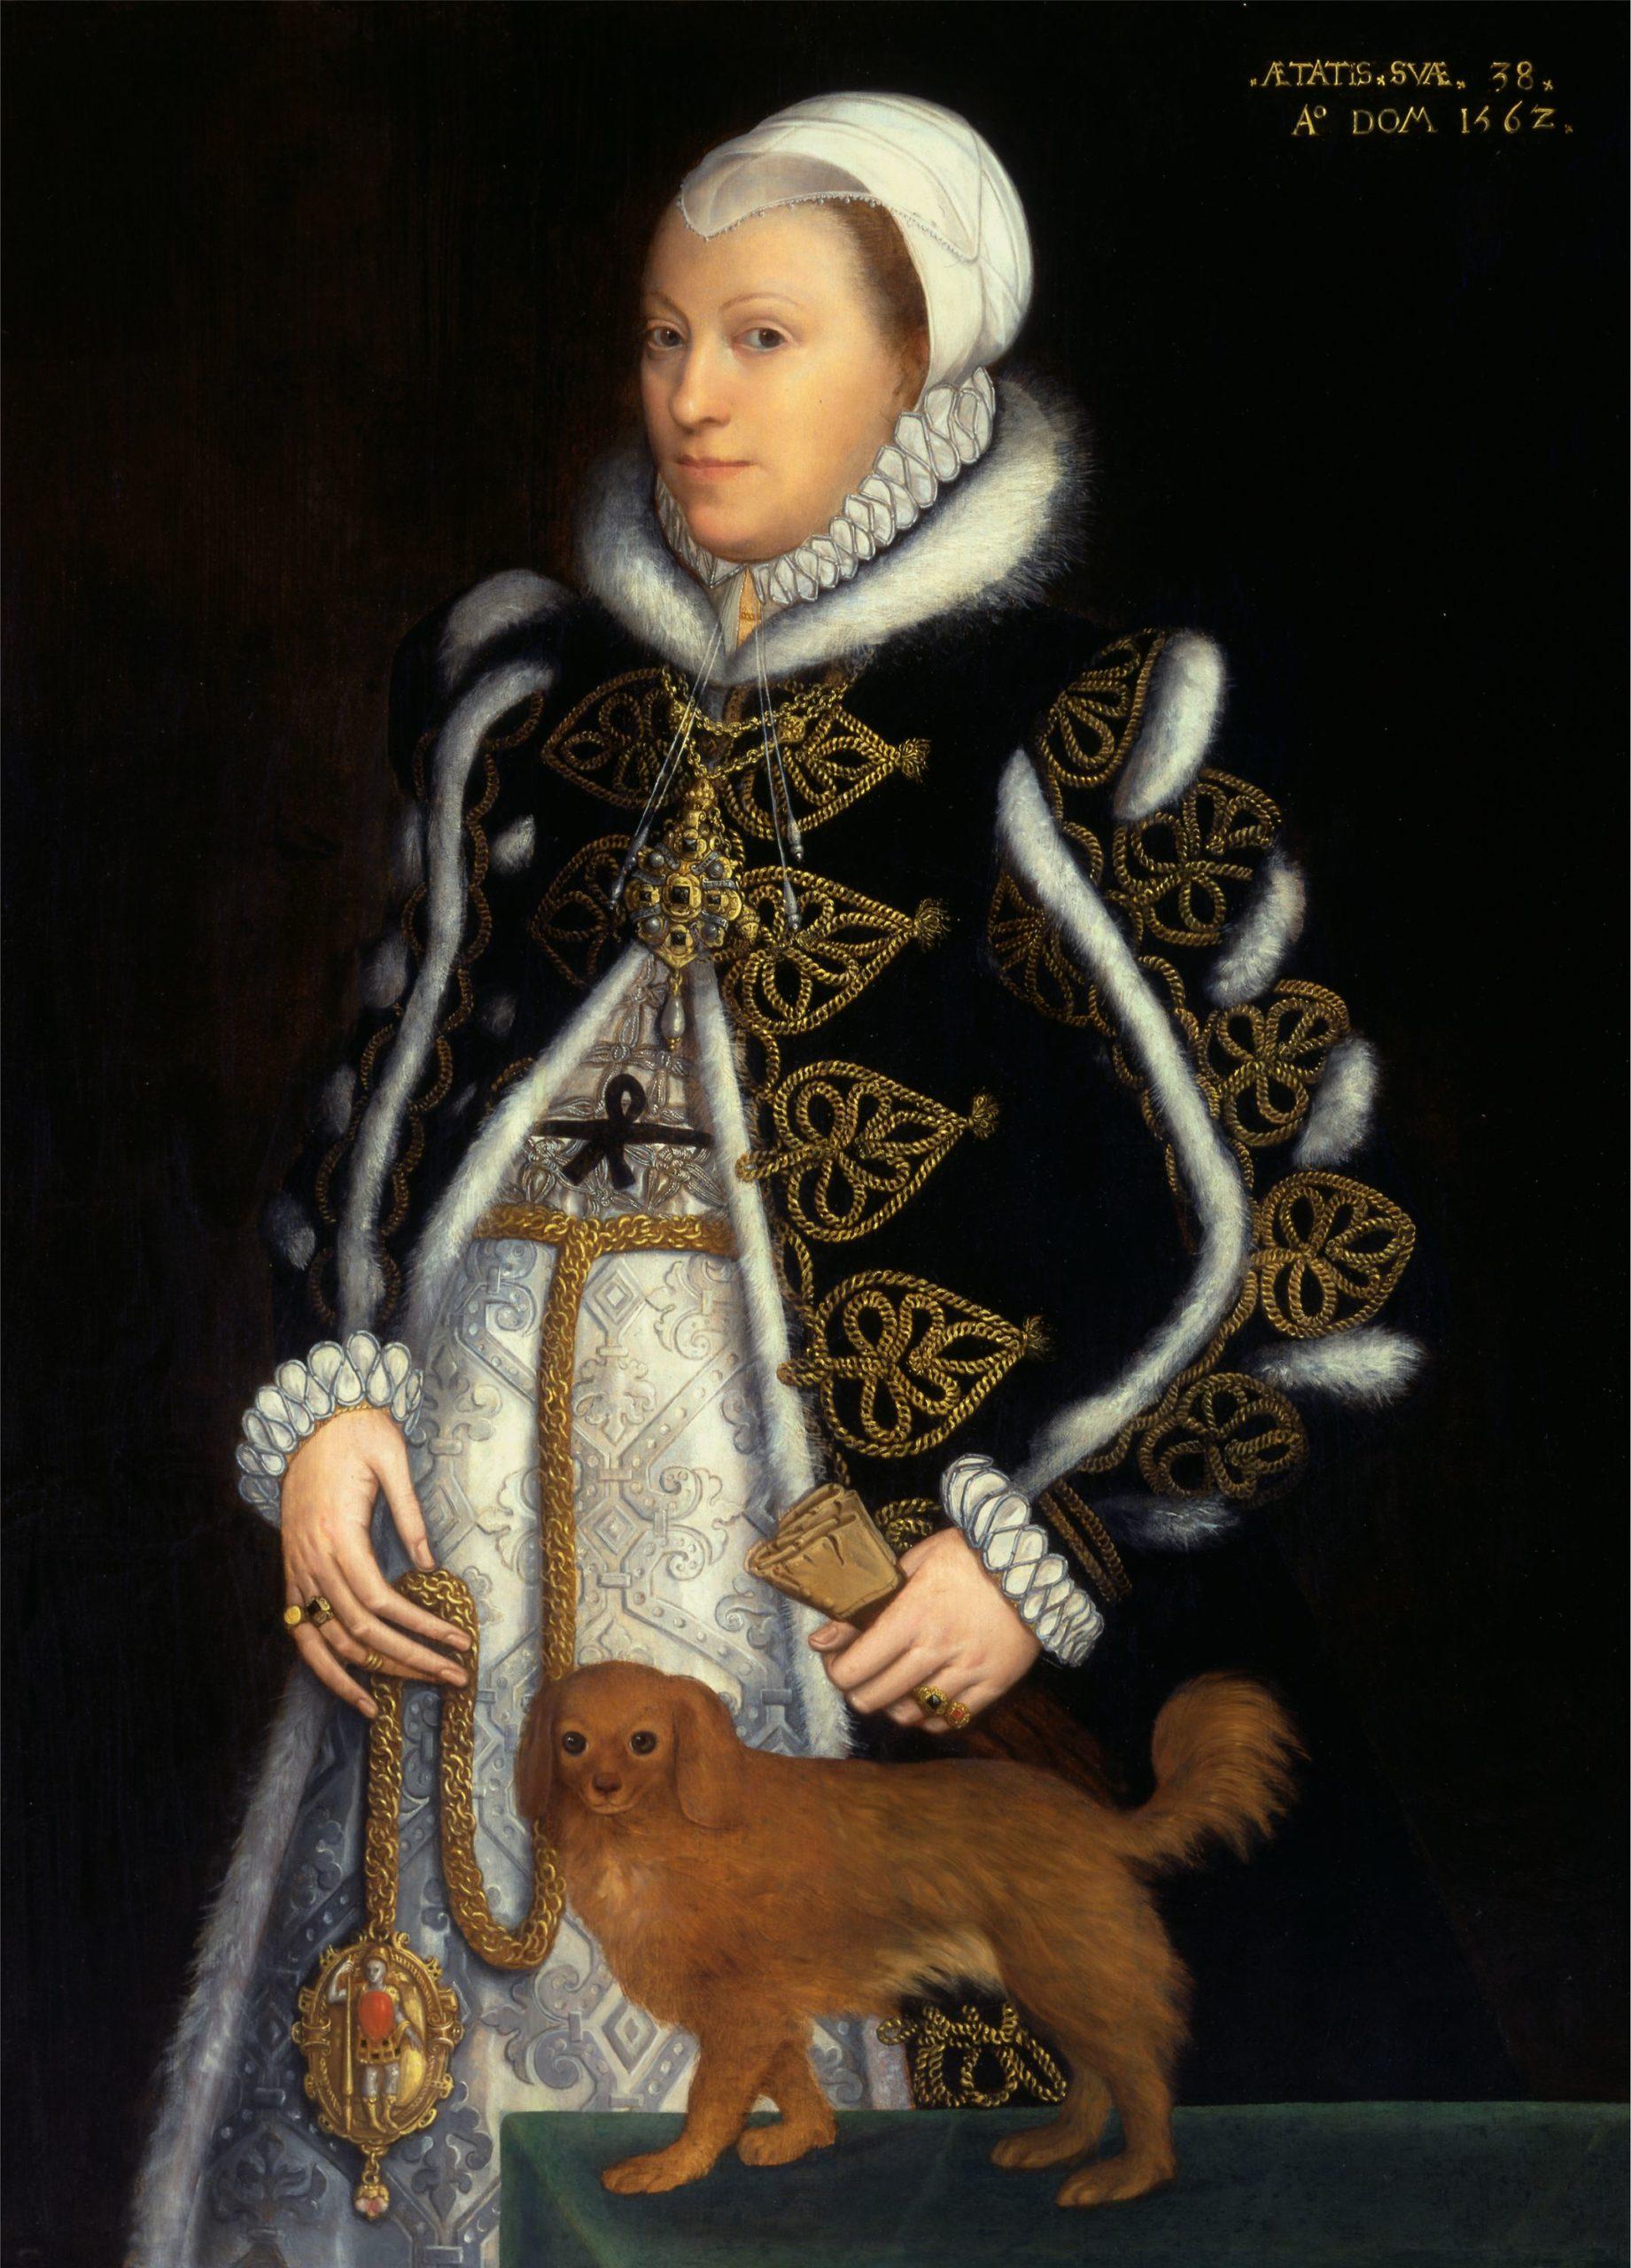 Lady Katherine Knollys by Steven van der Meulen